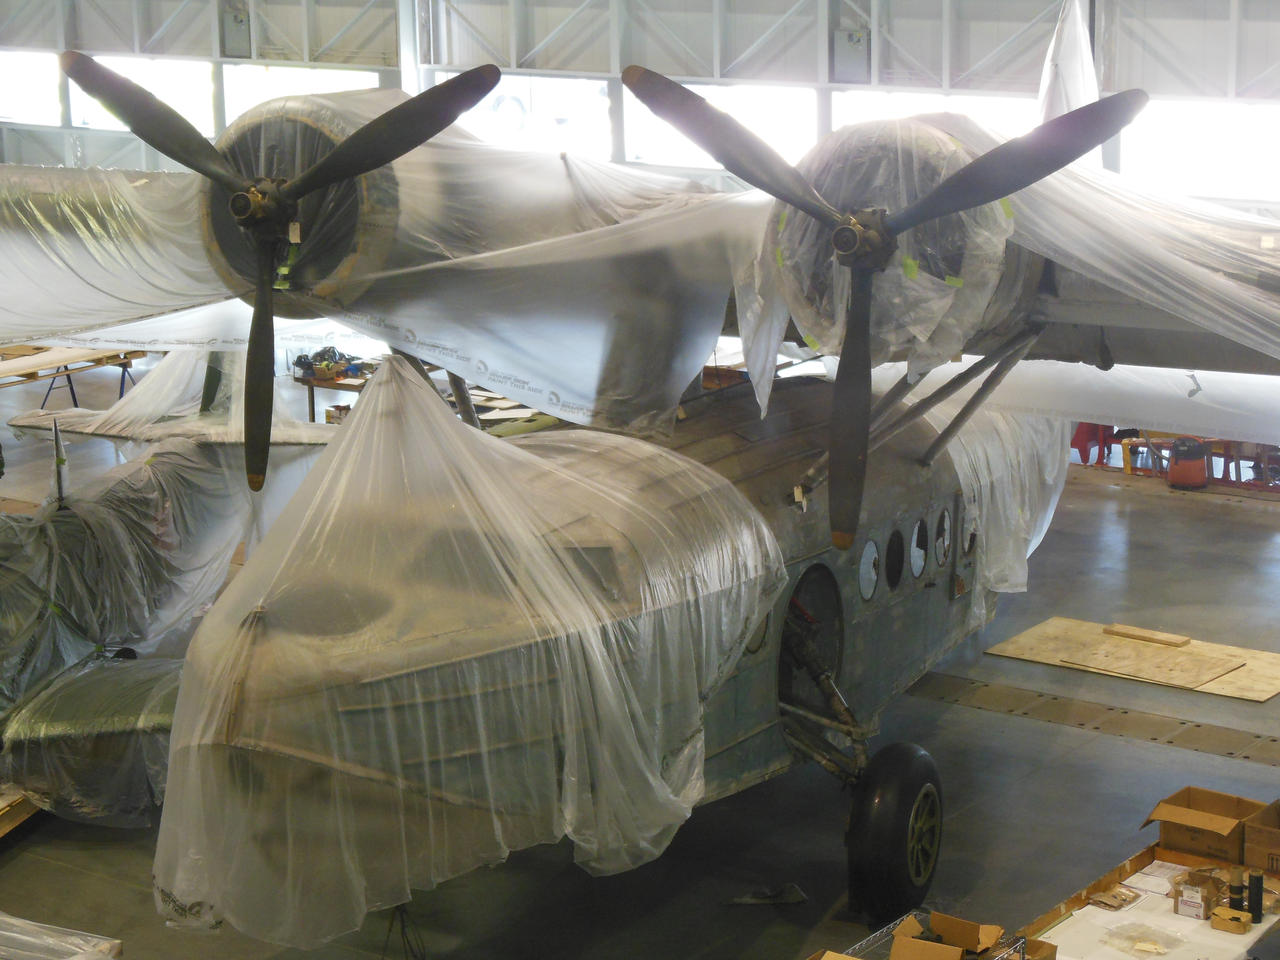 Sikorsky JRS-1 Flying Boat Restoration by rlkitterman